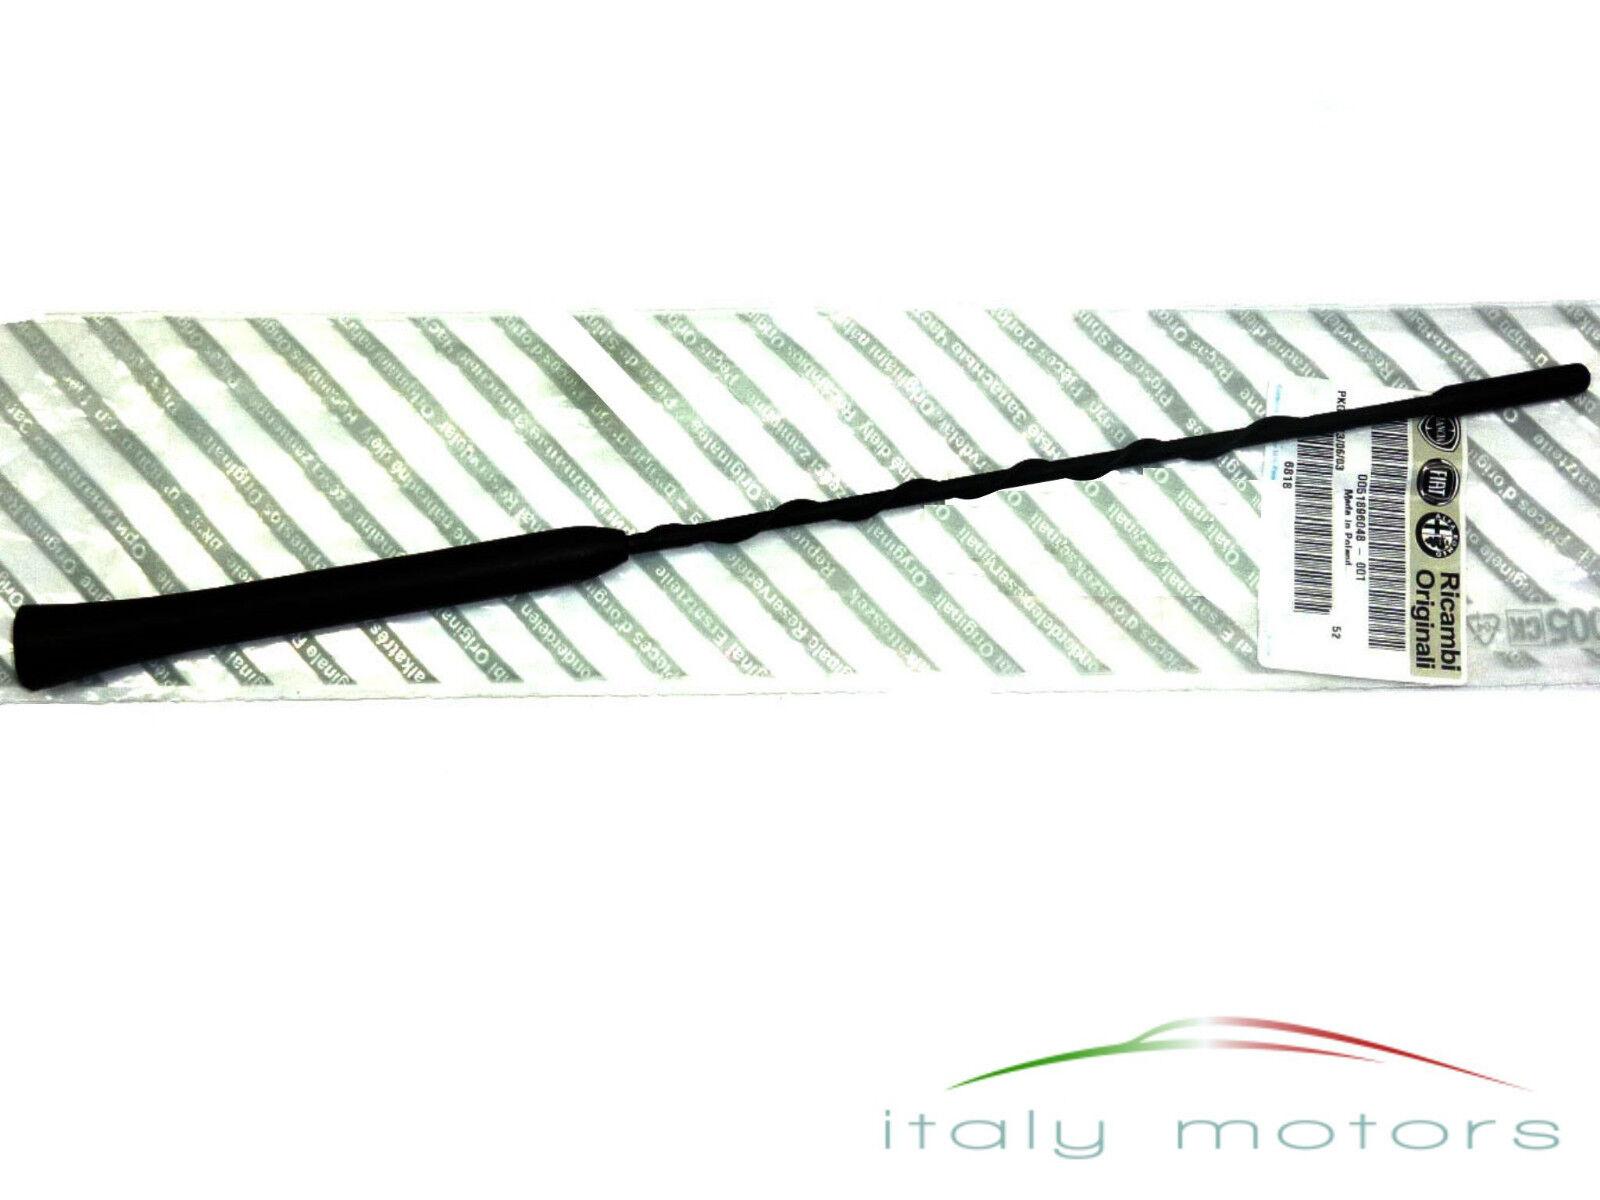 fiat grande punto evo 500 abarth original antennenleiter antenne m5 51896048 ebay. Black Bedroom Furniture Sets. Home Design Ideas